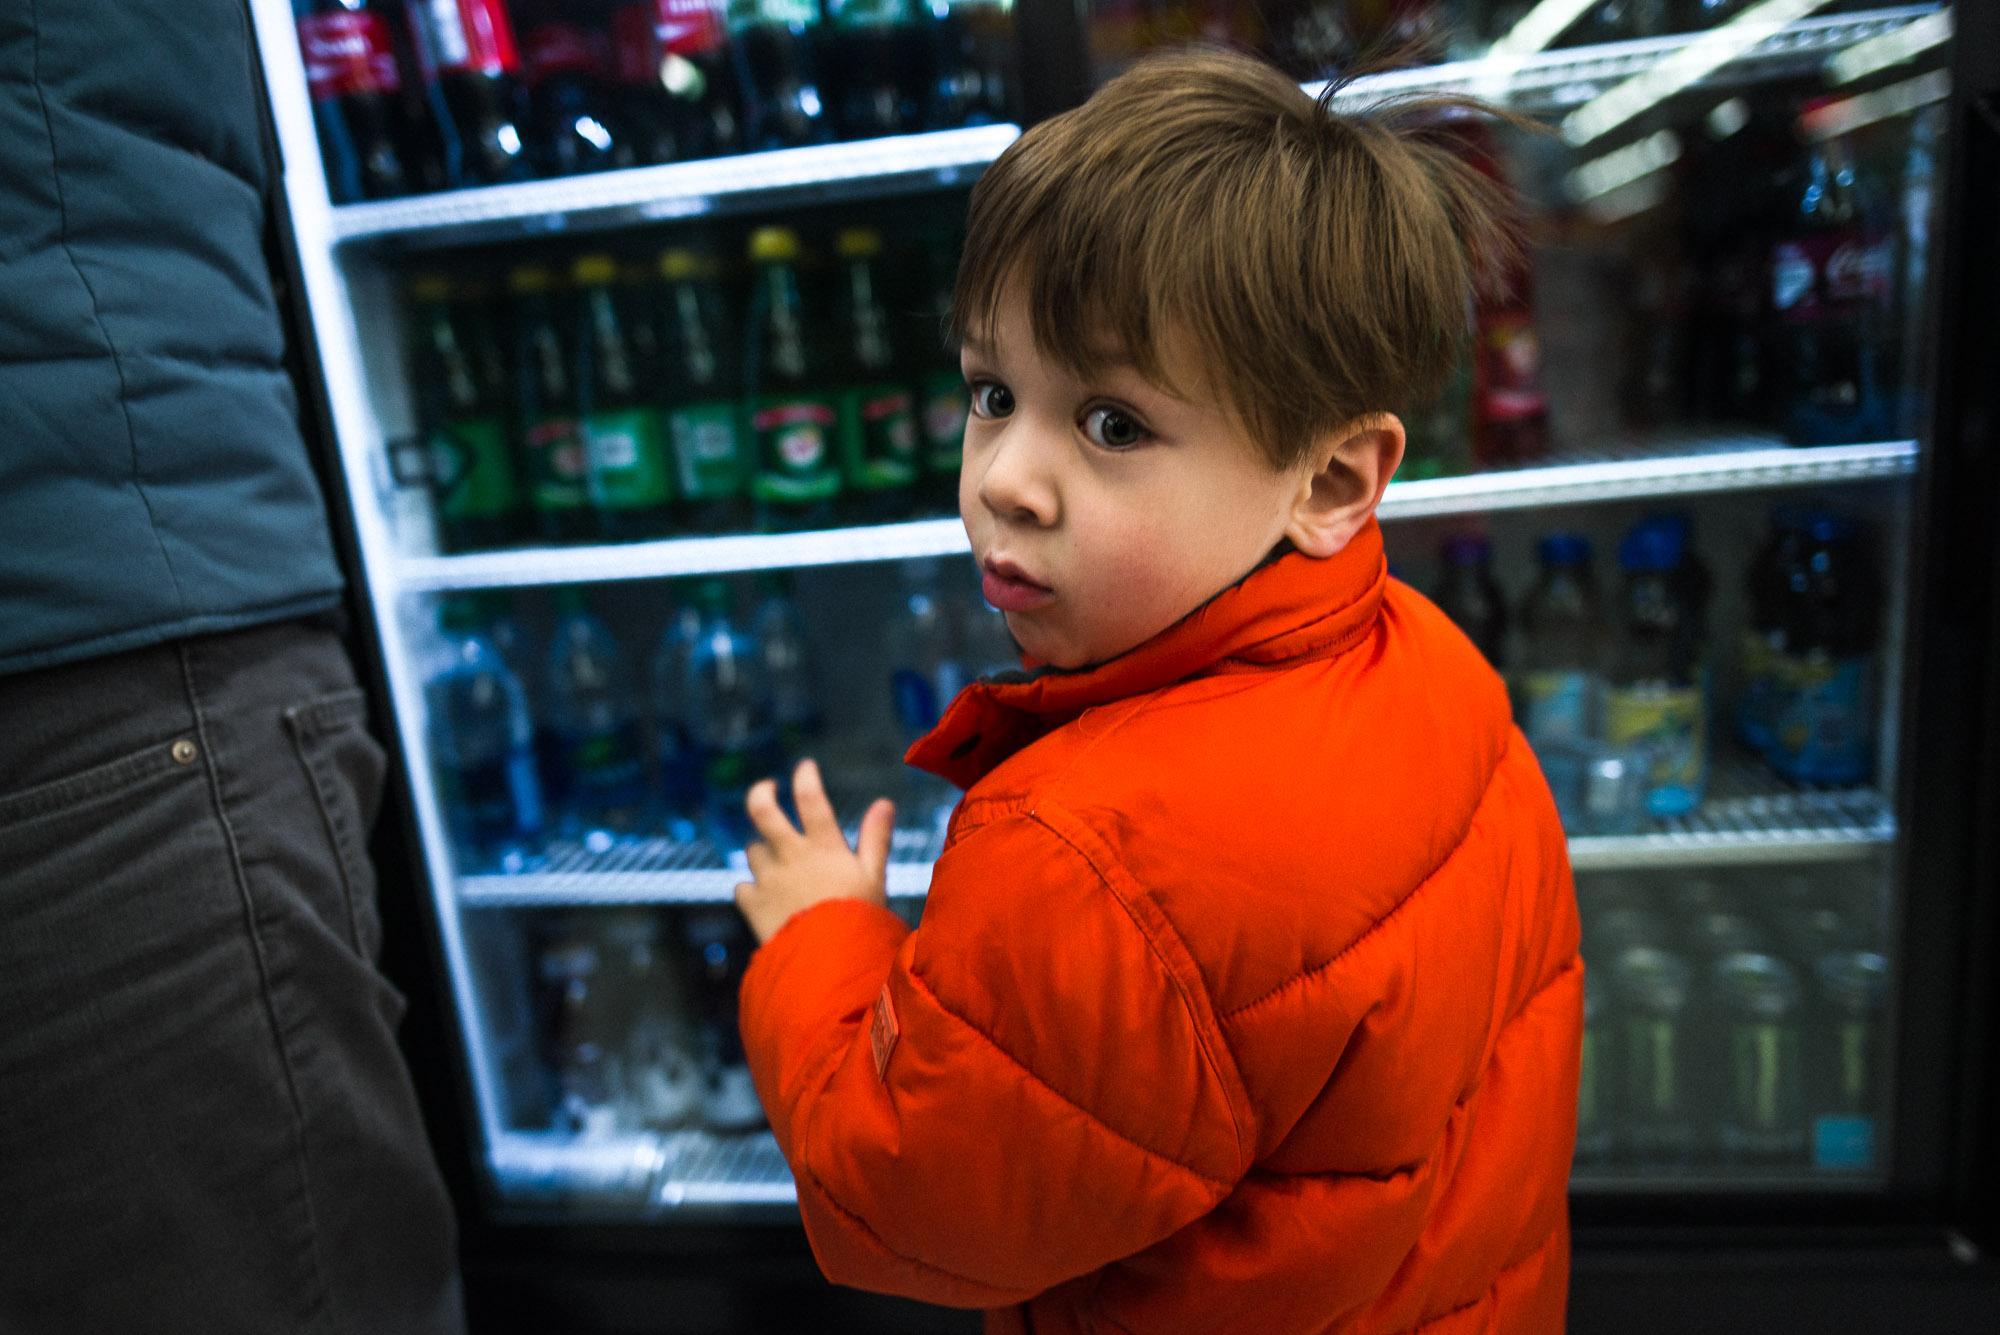 boy in orange coat looks back from a drink vending machine